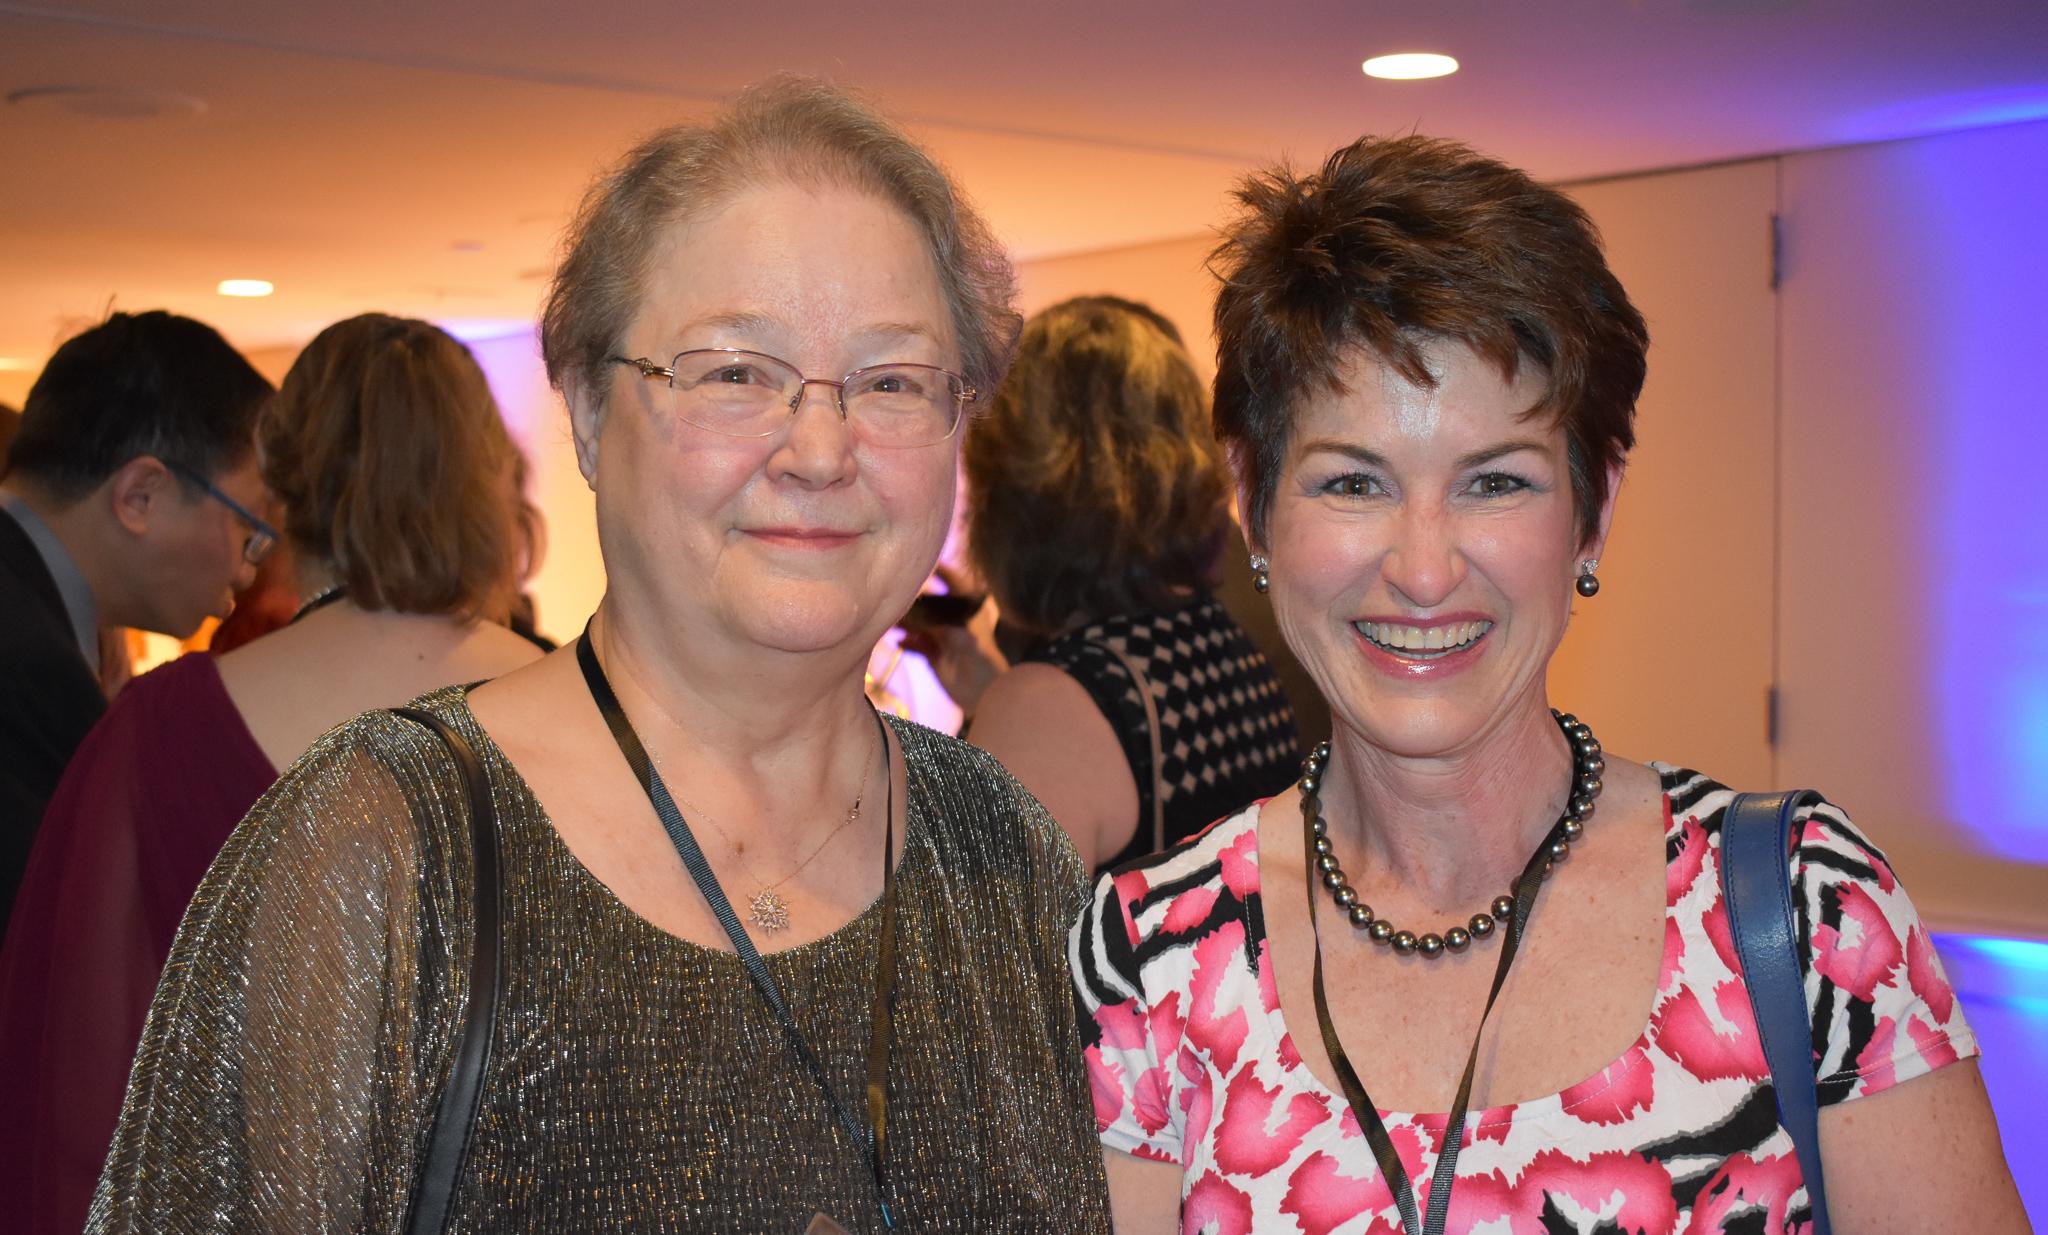 Sharon Shafer & Kathy Lupinacci